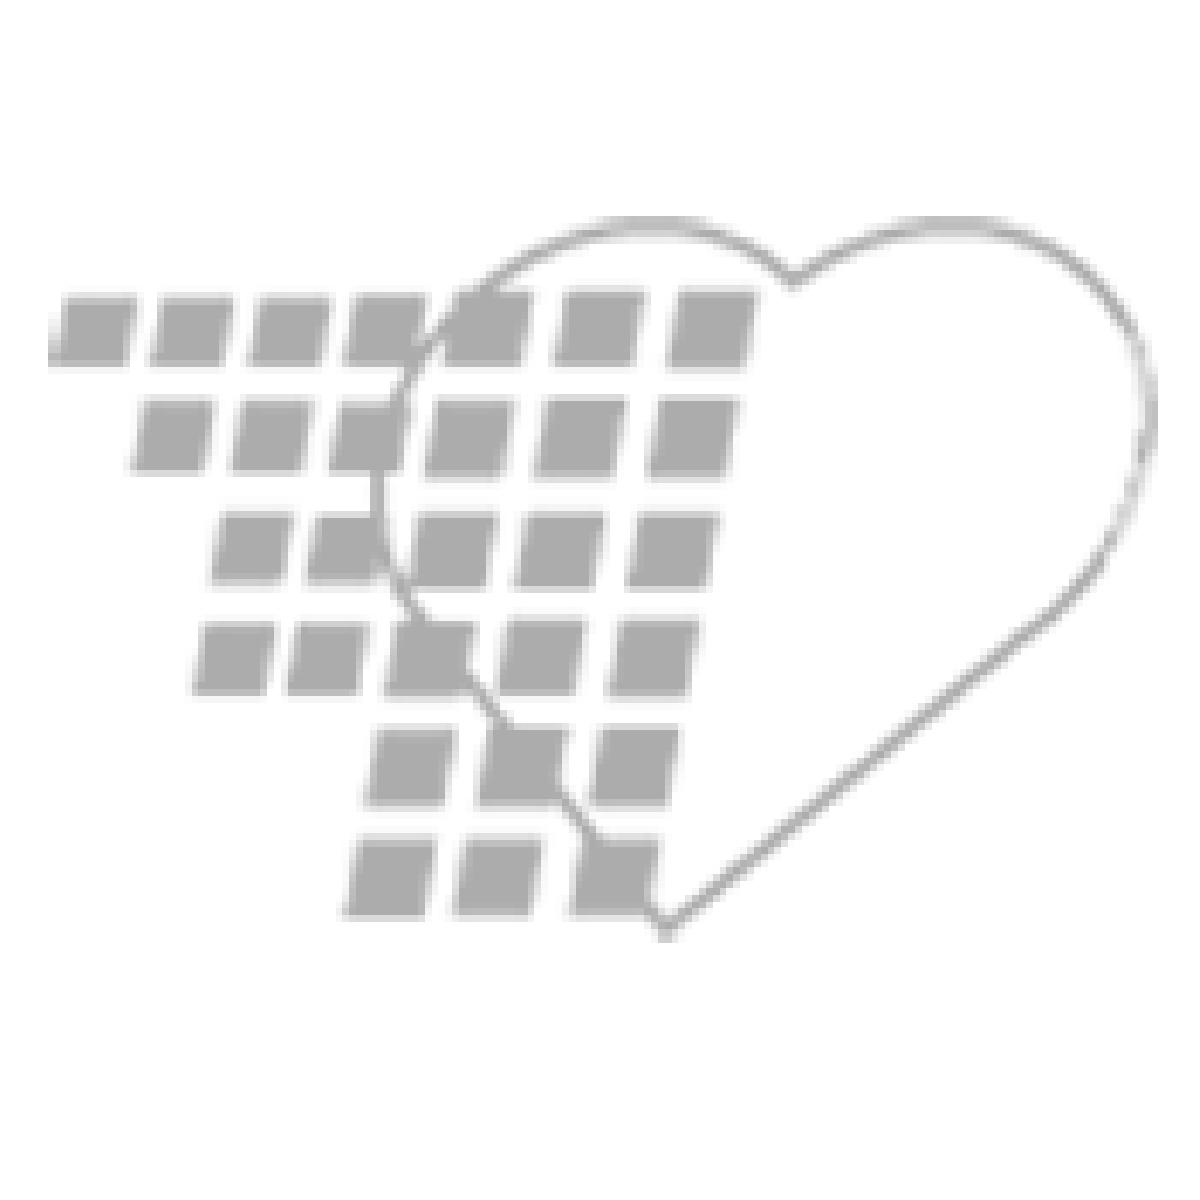 06-93-9014 - Demo Dose® Methergin (Methylergonovin) 1 mL Ampule 0.2mg/mL